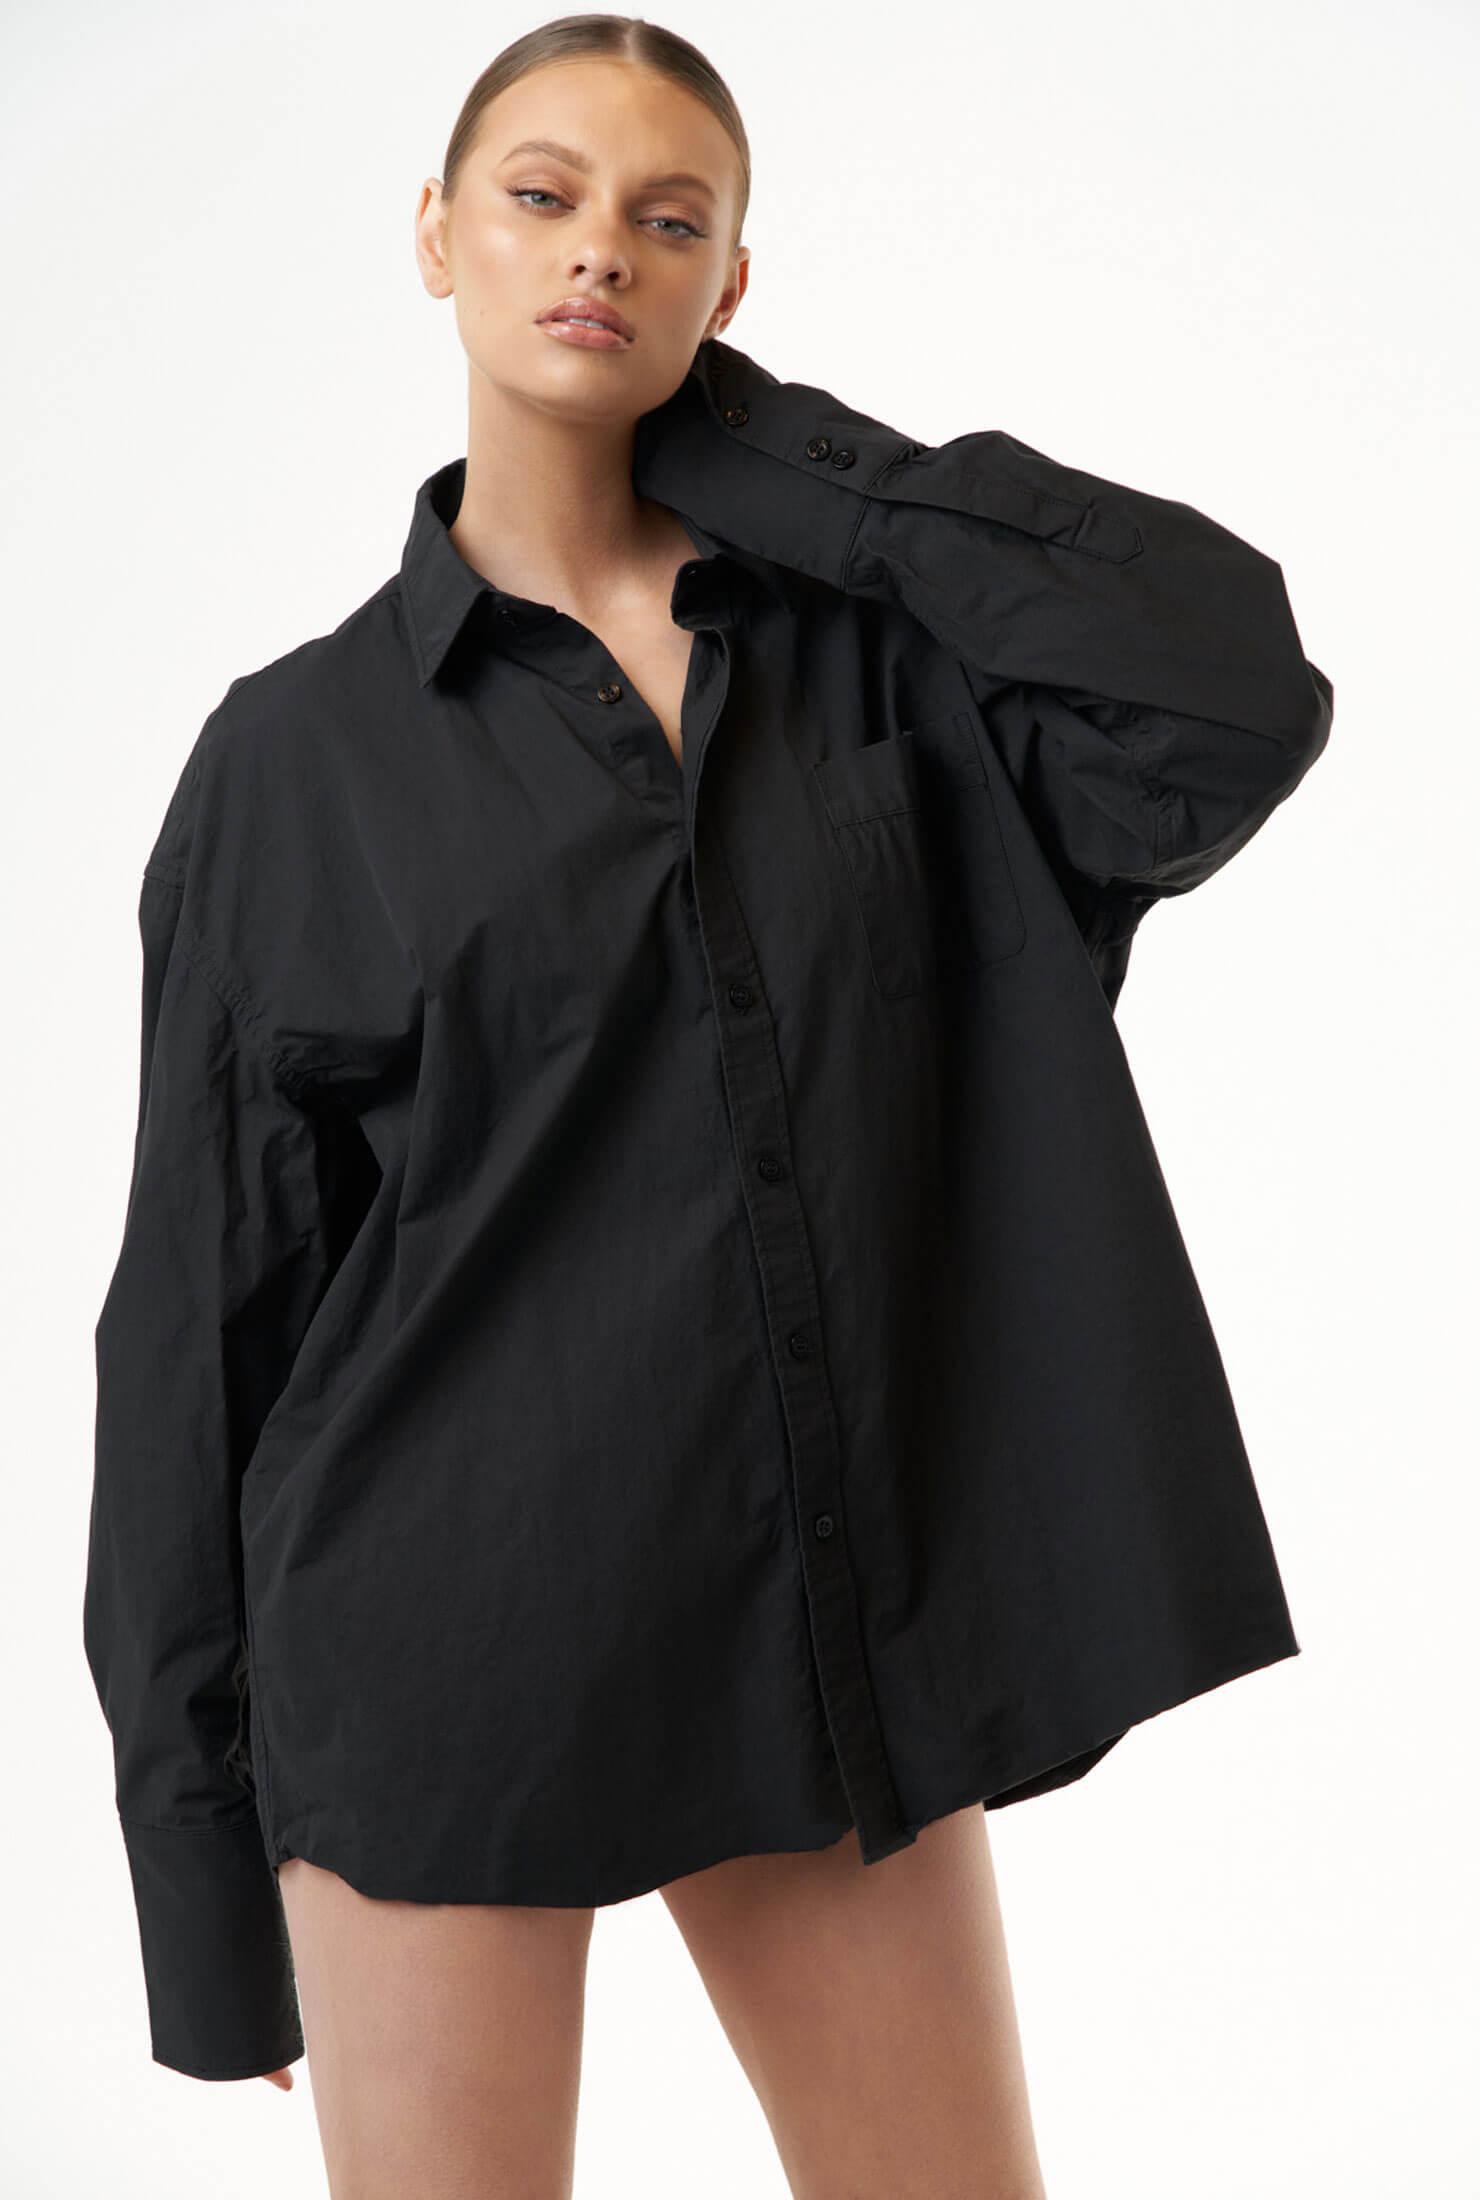 THE PRESLEY BLACK SHIRT